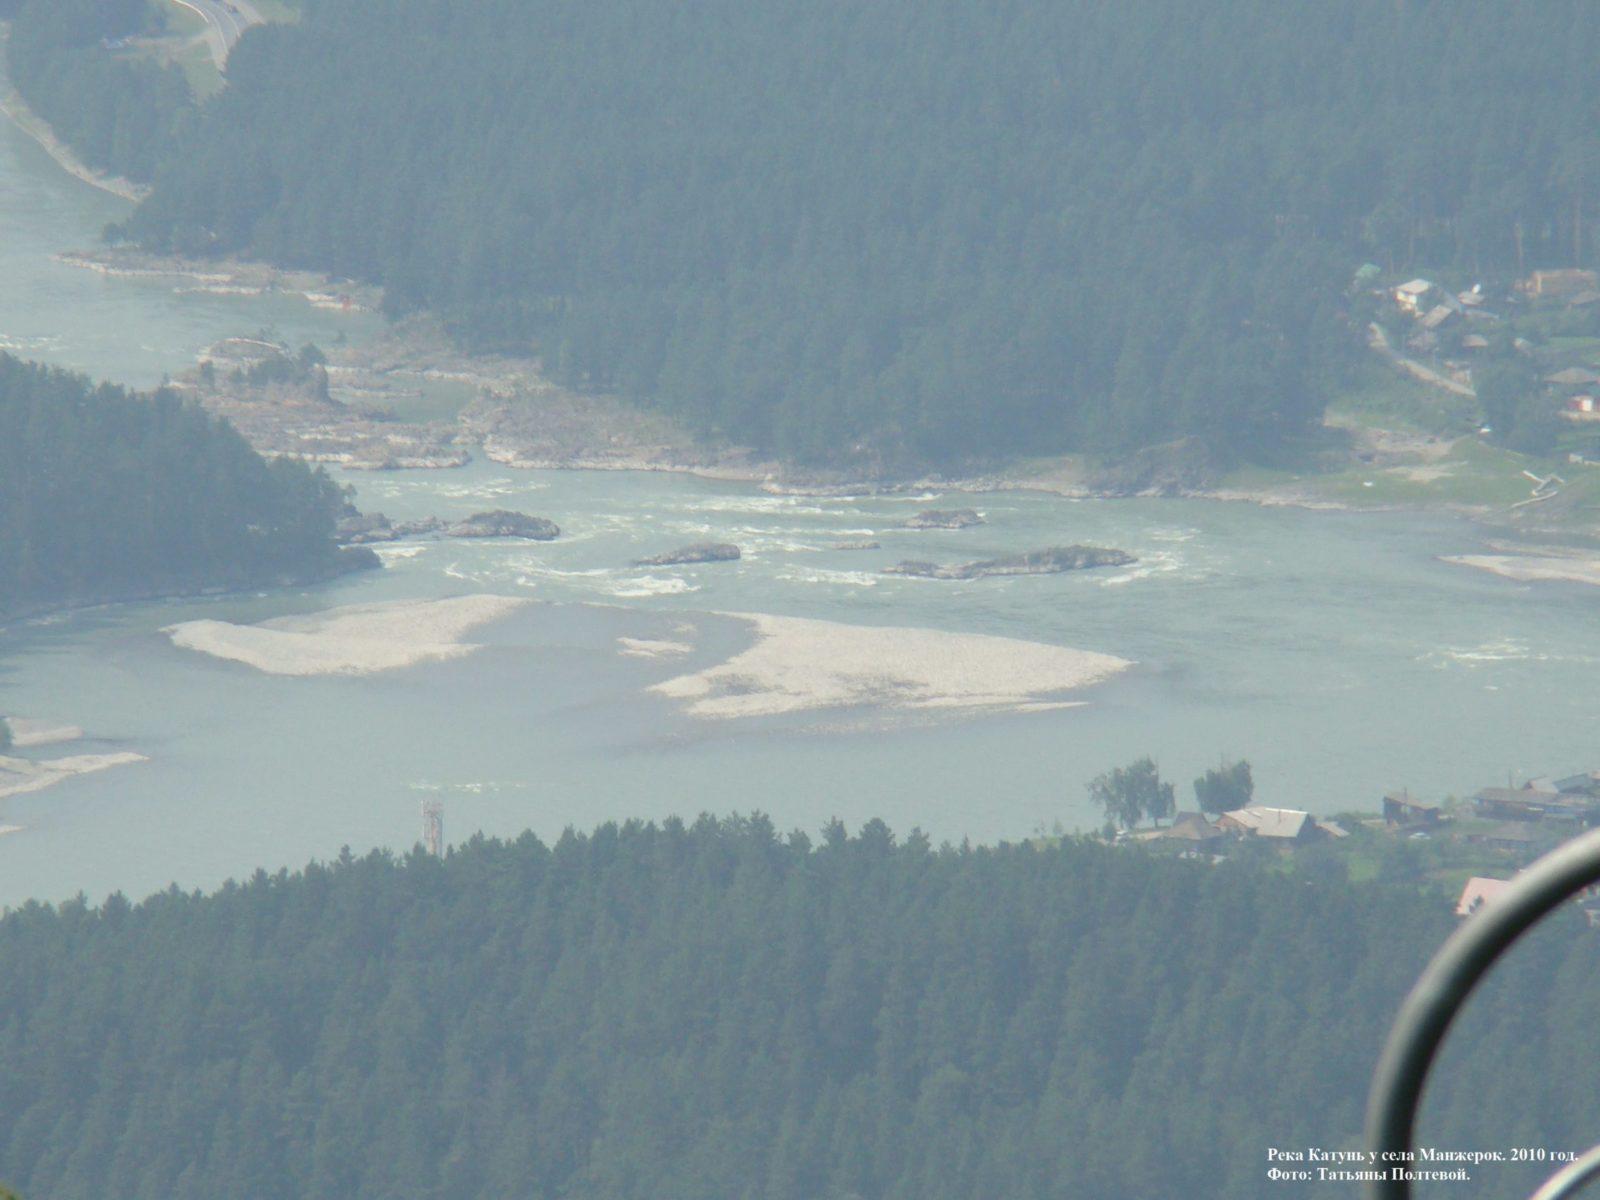 Река Катунь у села Манжерок. 2010 год.